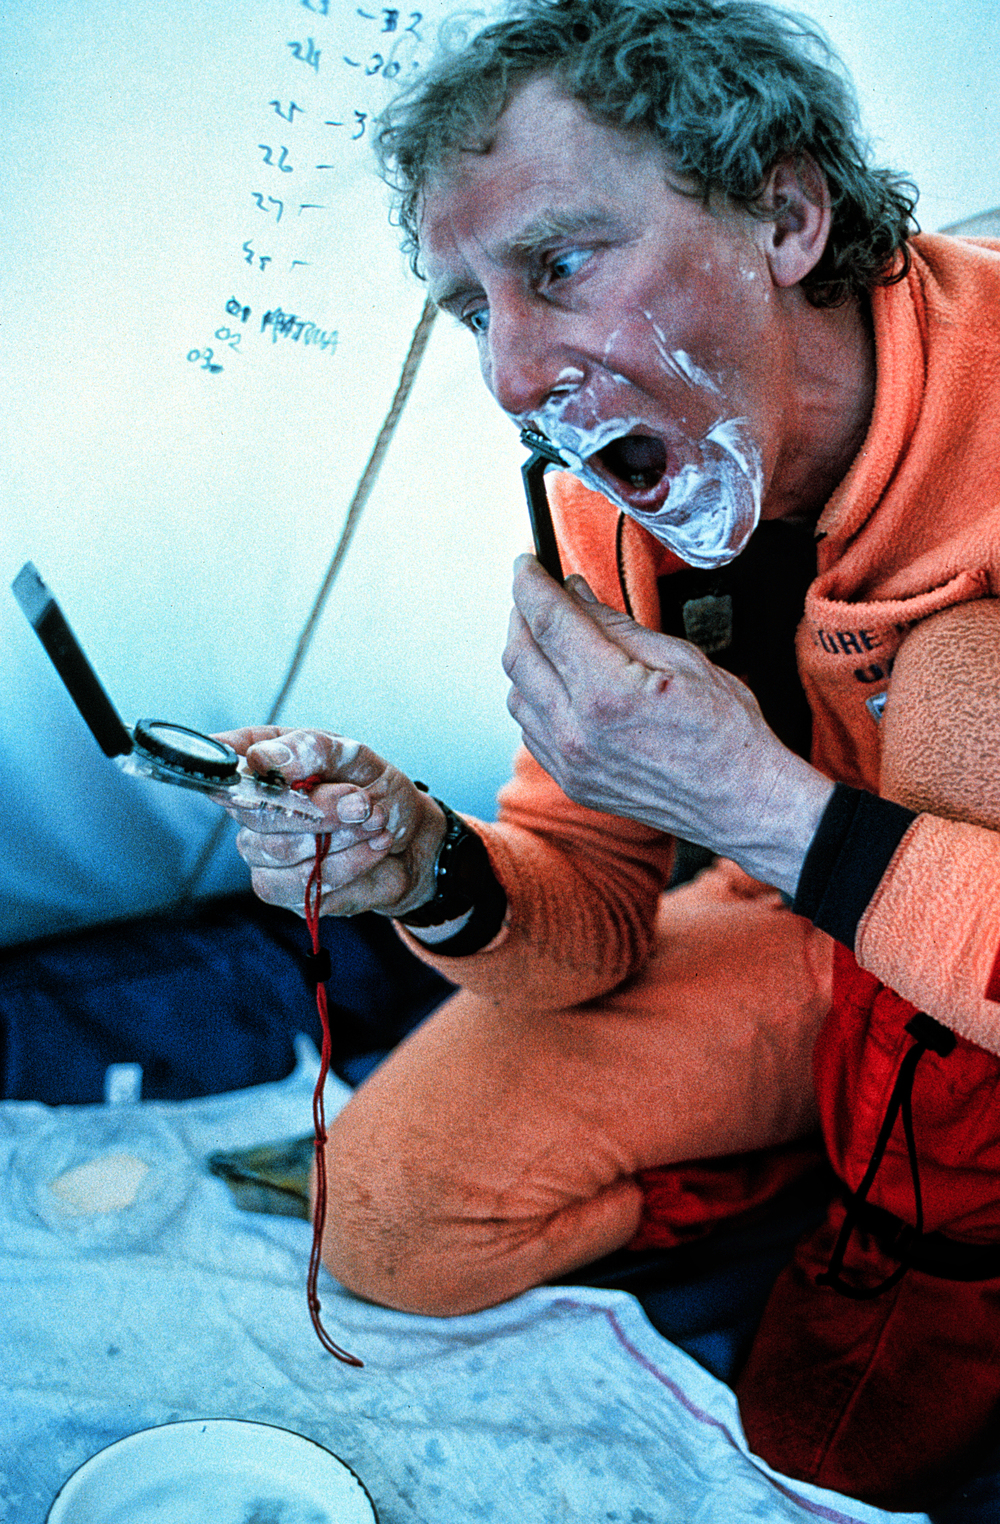 Shaving at -40. ©Trans-Antarctica photo by Per Breiehagen